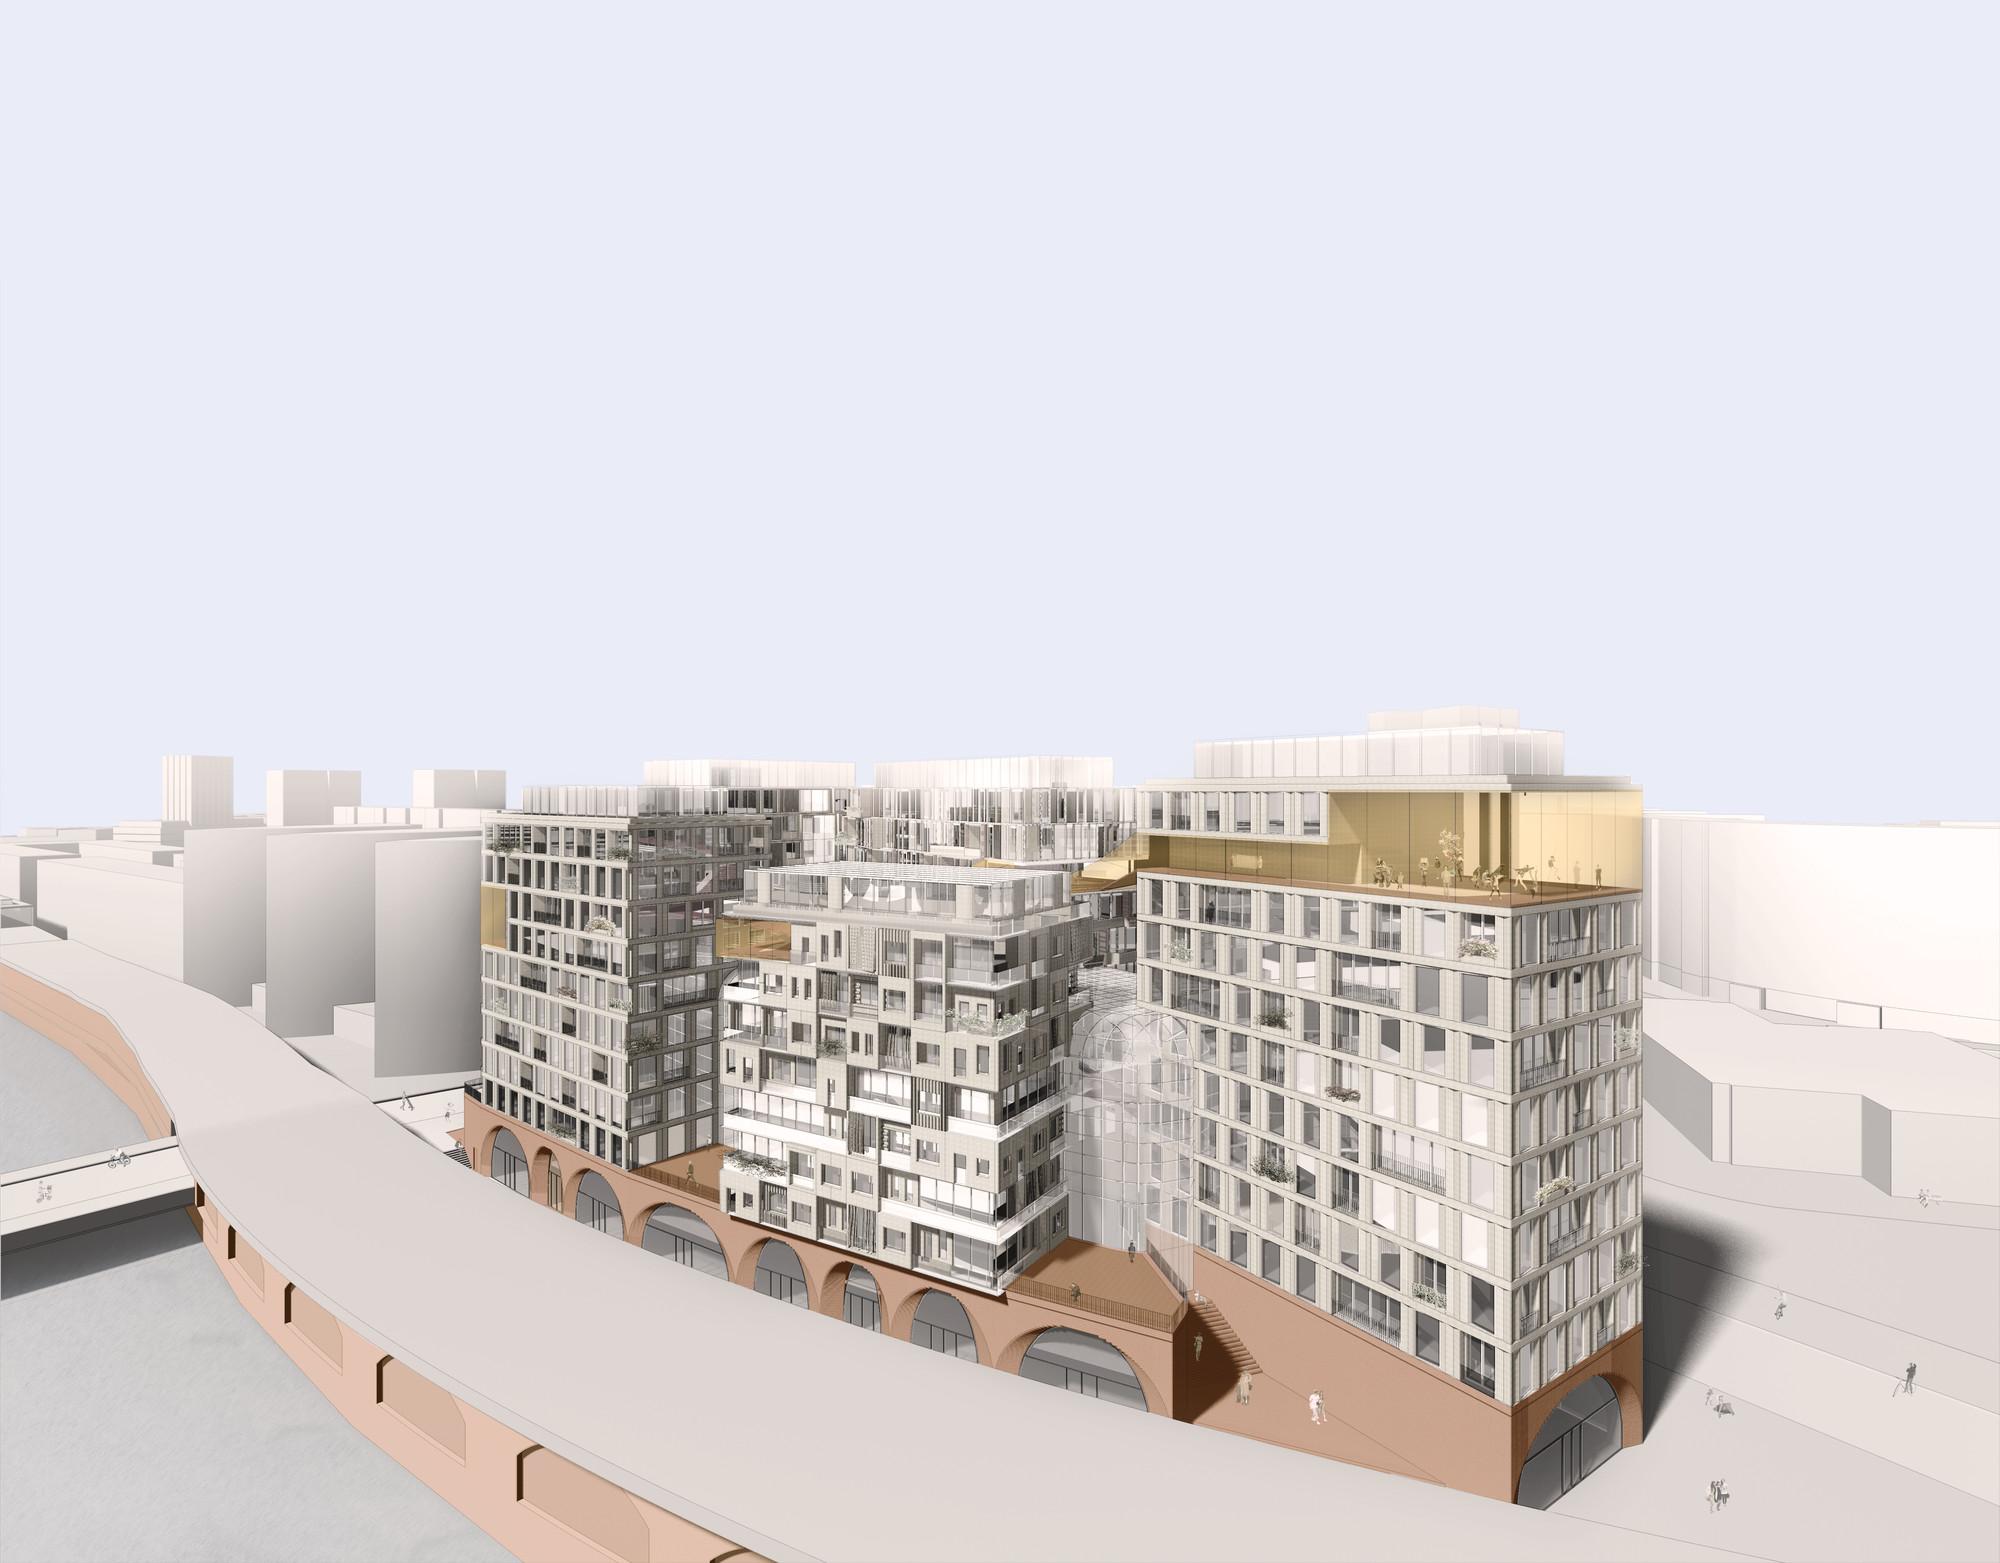 gallery of graft kleihues kleihues design work live housing in berlin 4. Black Bedroom Furniture Sets. Home Design Ideas